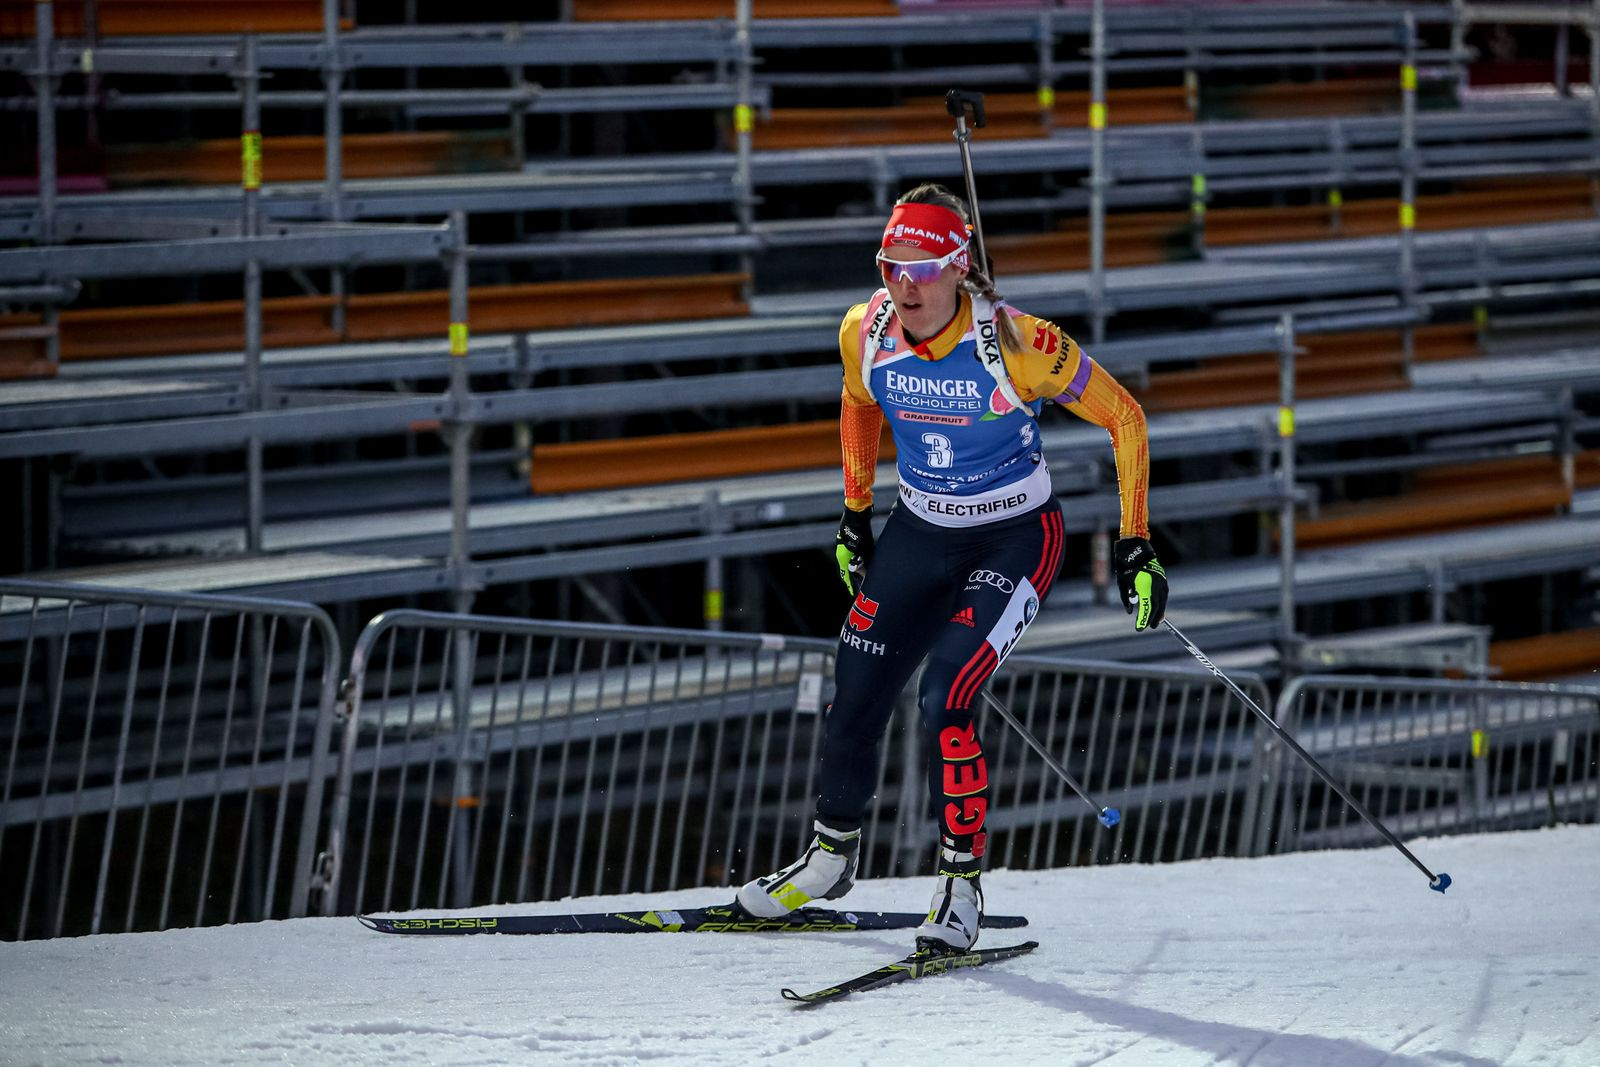 IBU Biathlon World Cup in Nove Mesto na Morave, Czech Republic - 05 Mar 2020